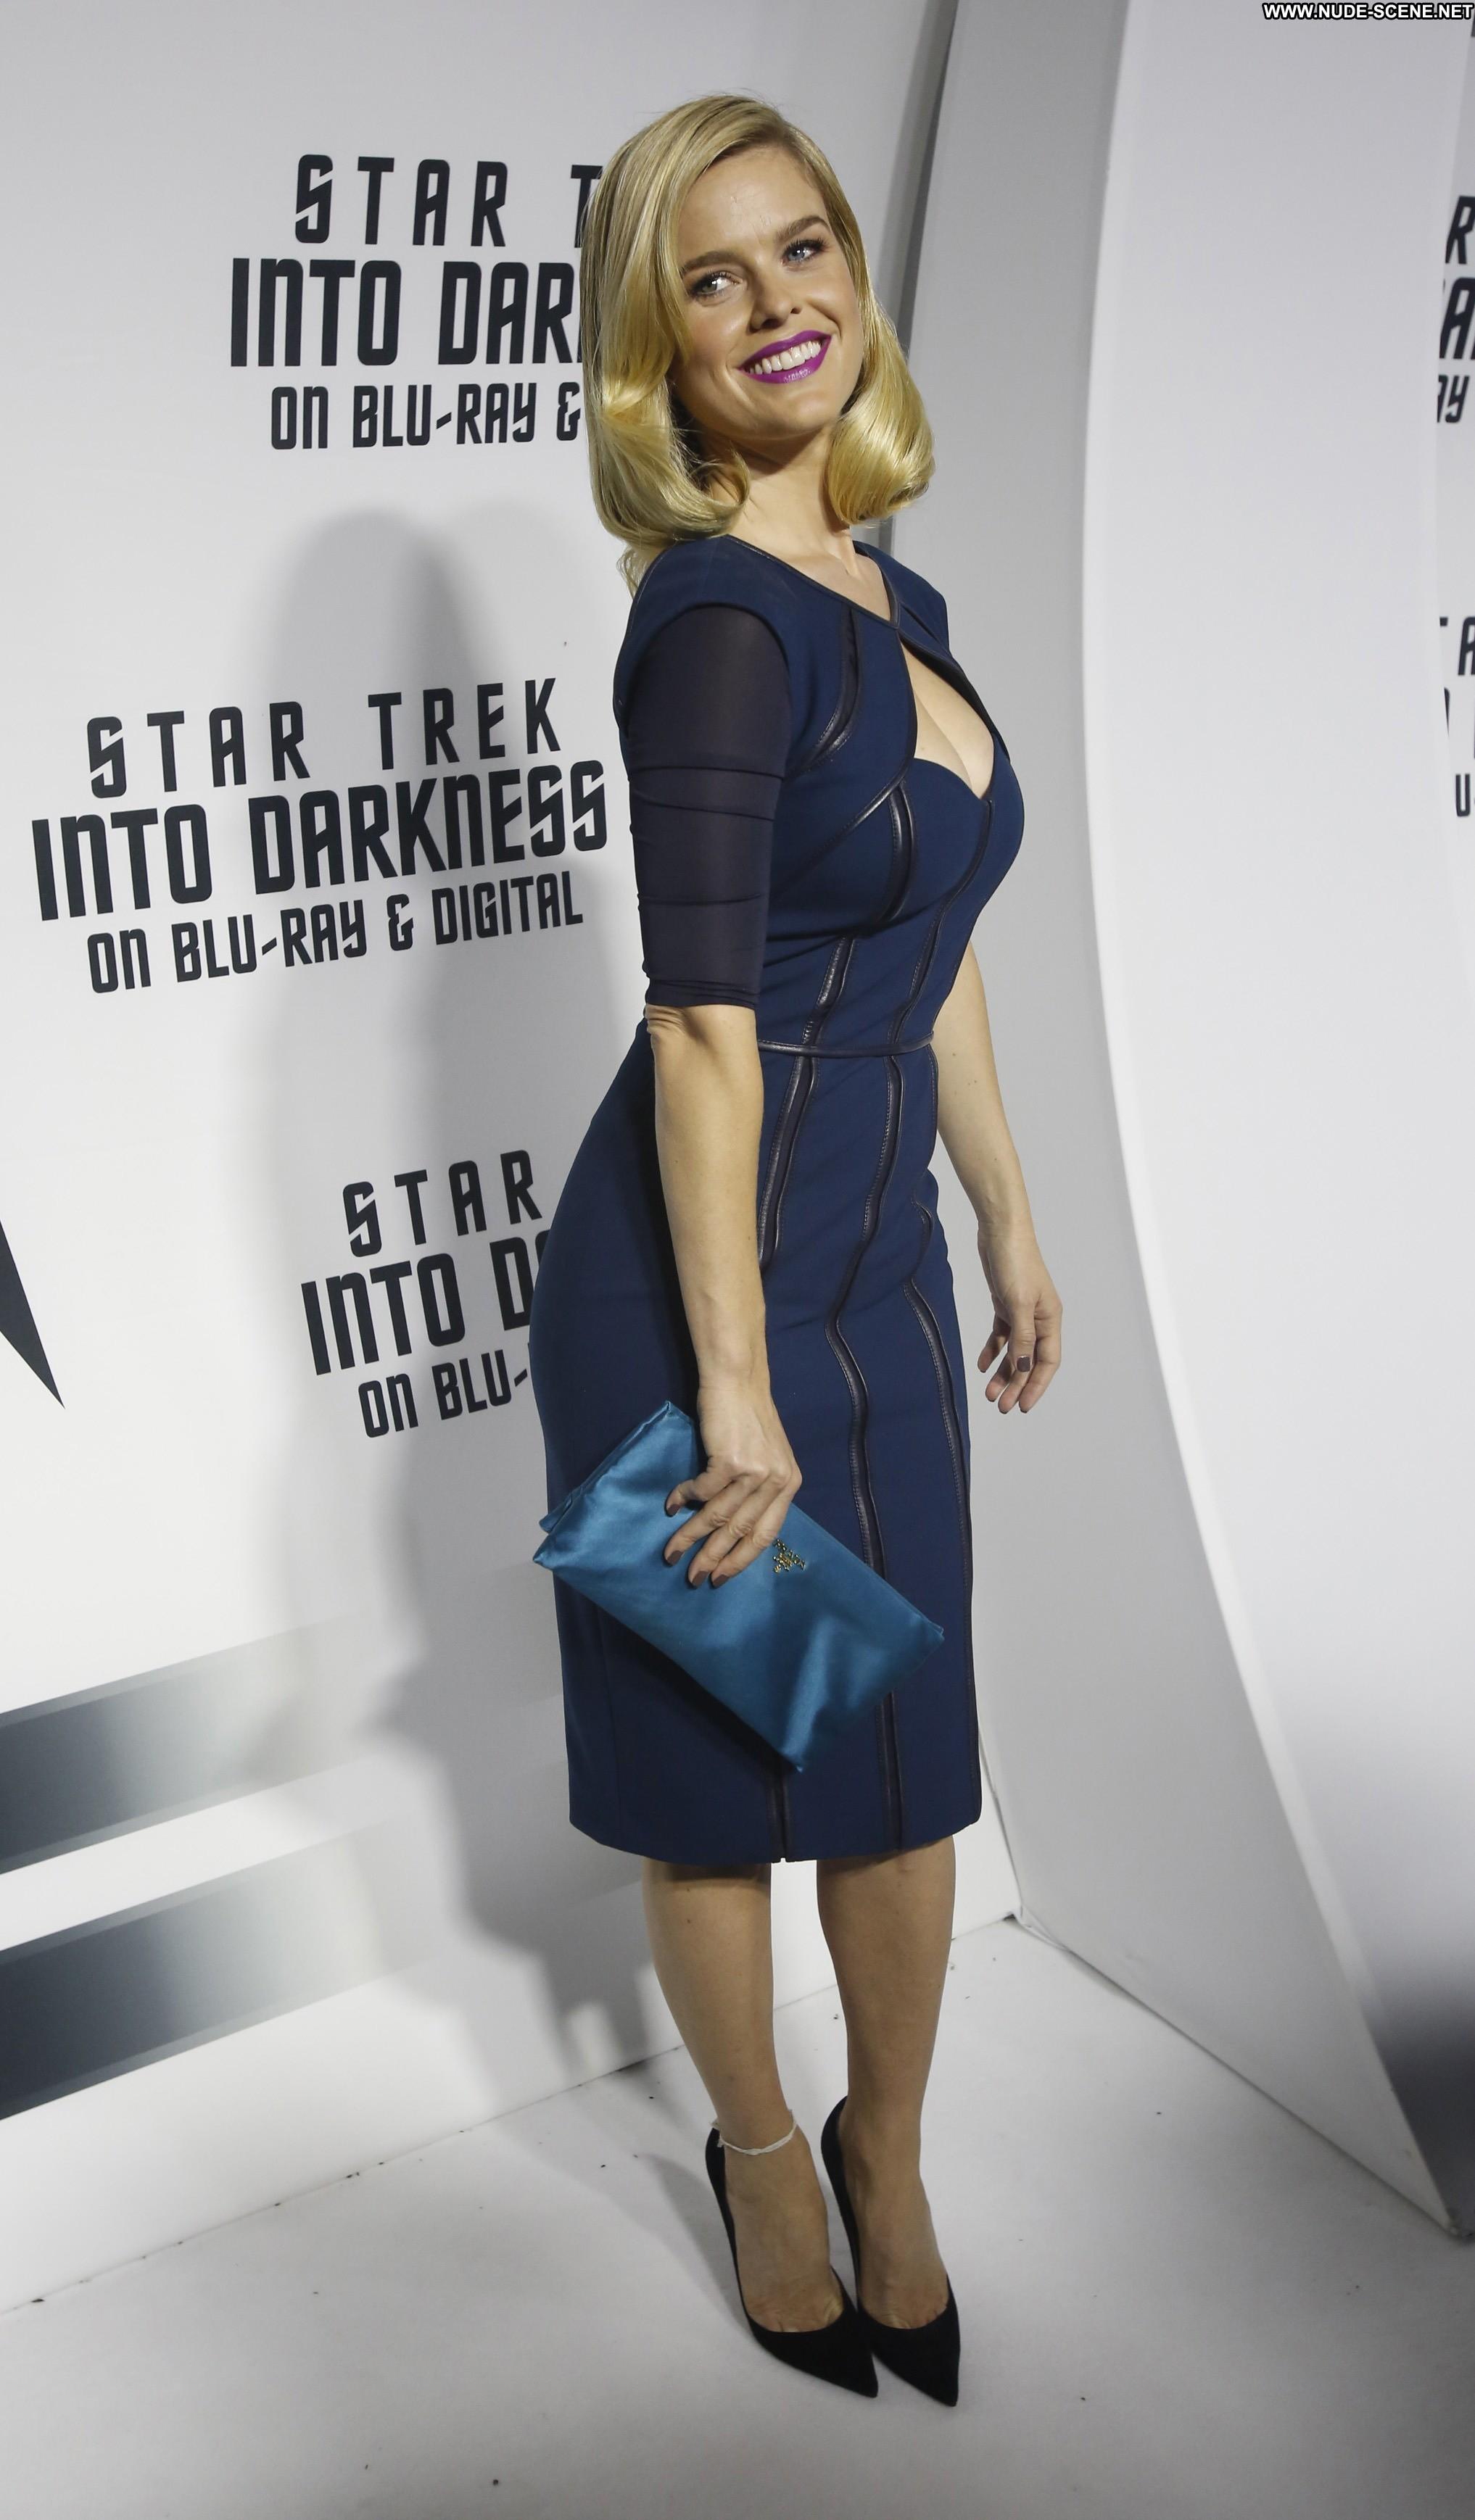 Alice Eve Star Trek Into Darkness Star Trek Into Darkness